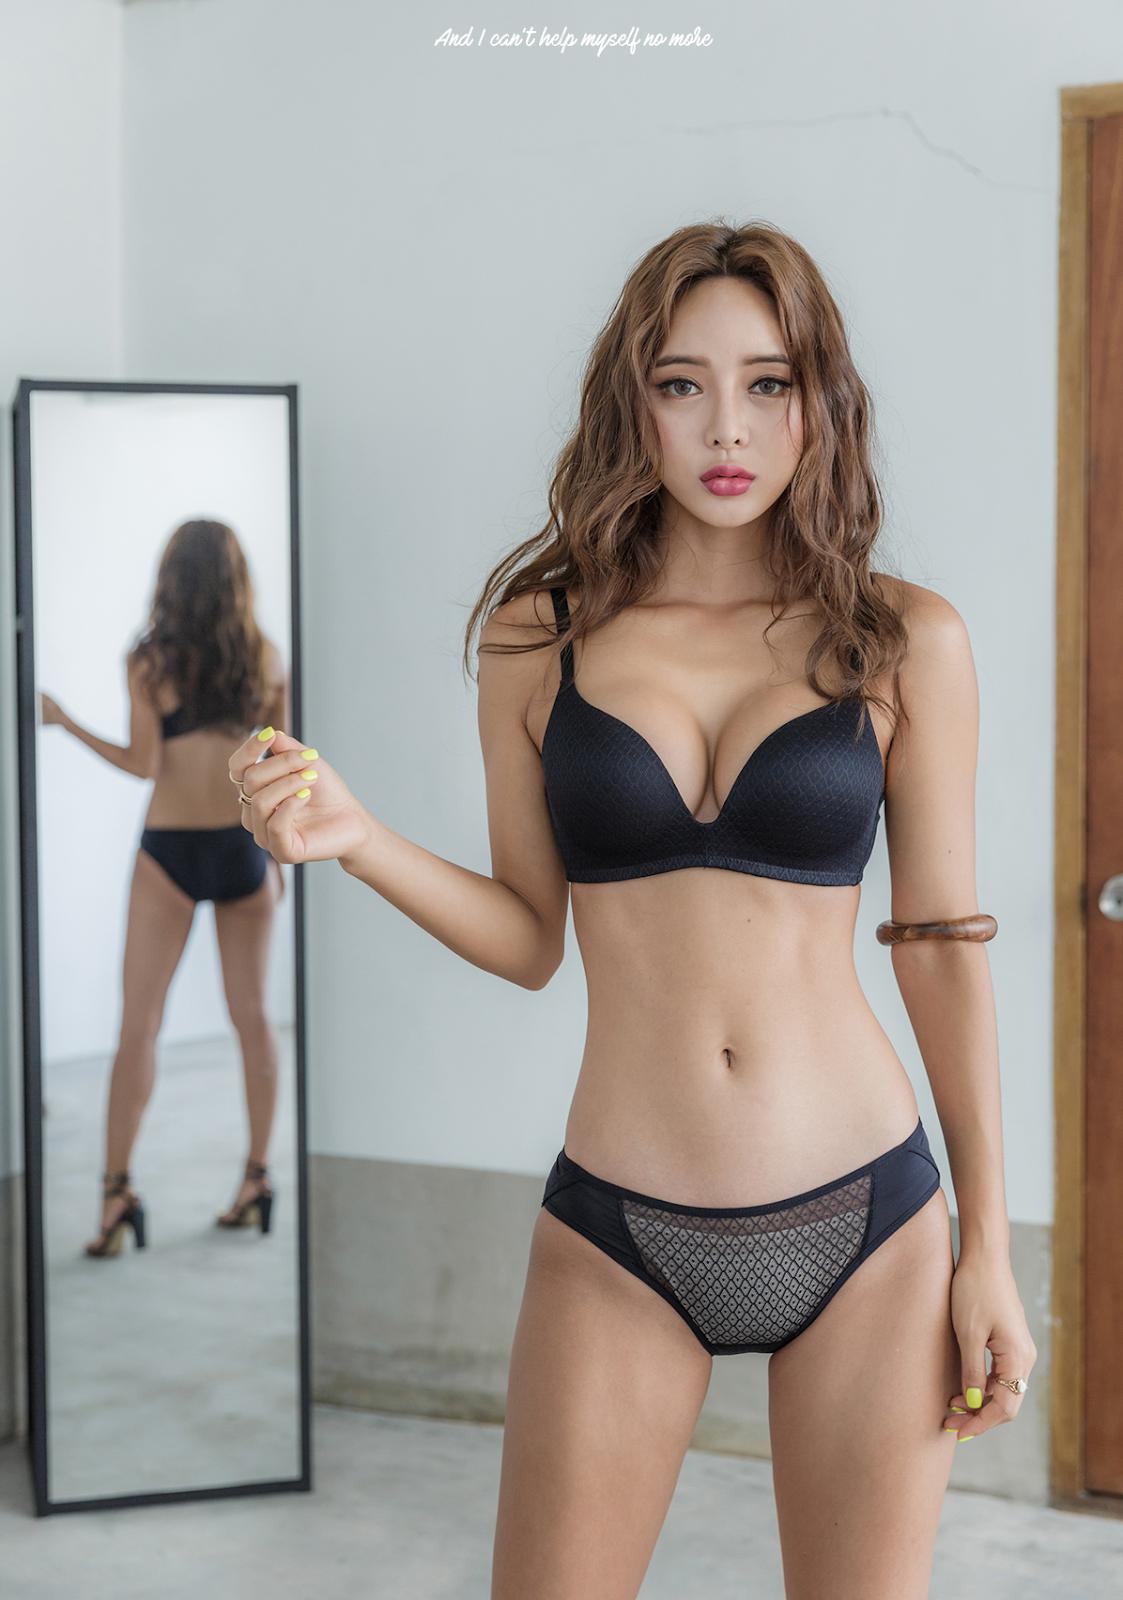 21 Photos of Koreas Hottest Lingerie Model